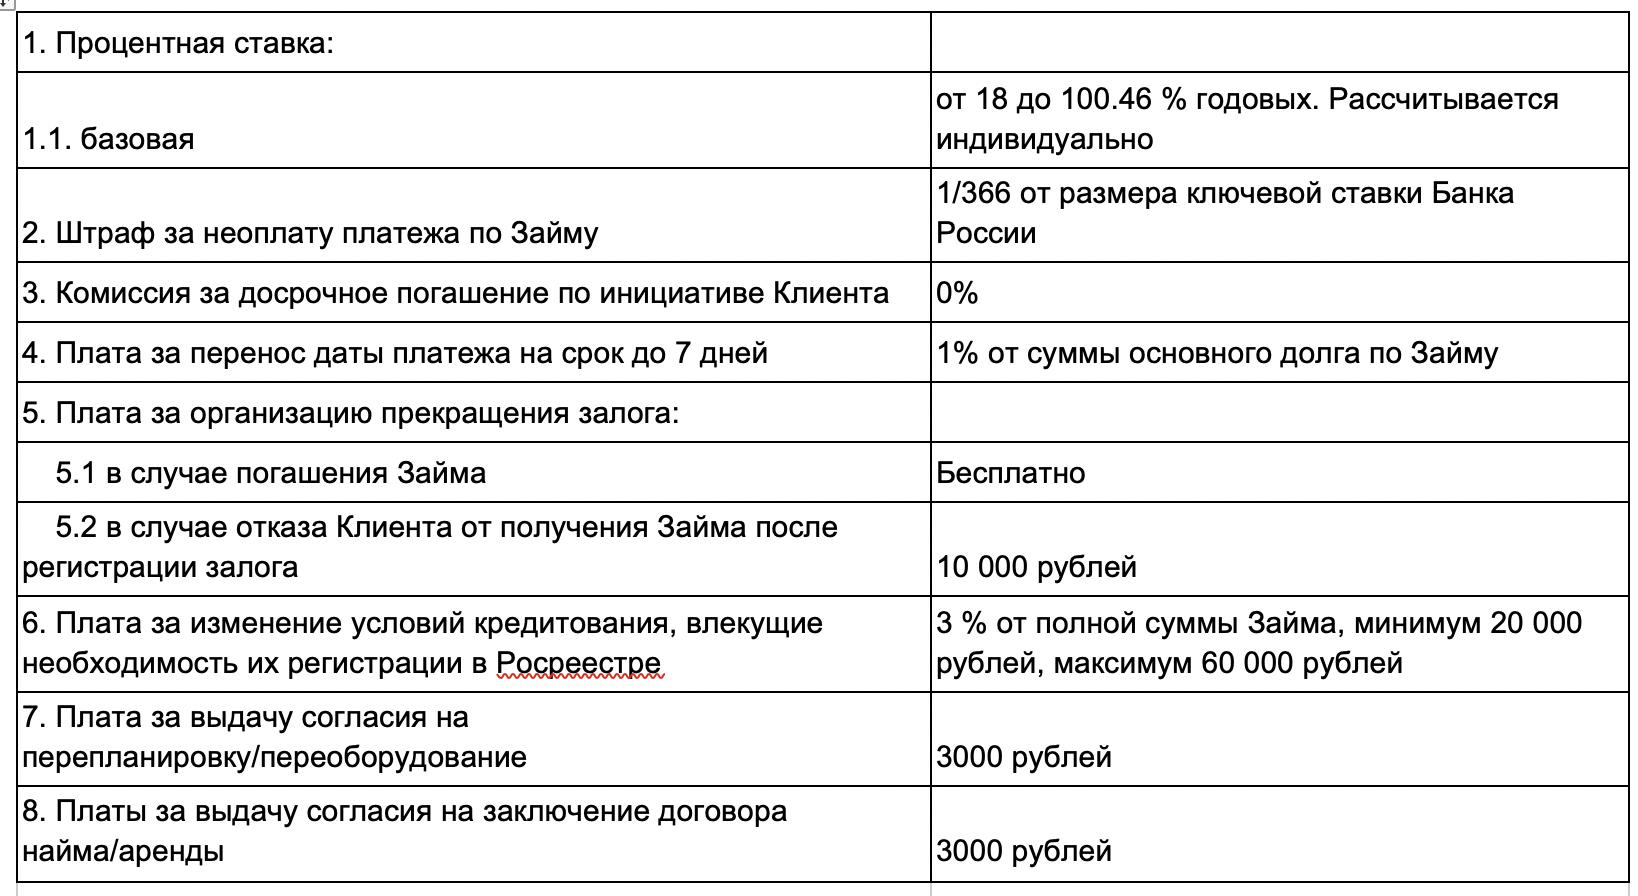 Совкомбанк кредитная карта онлайн заявка оформить оренбург